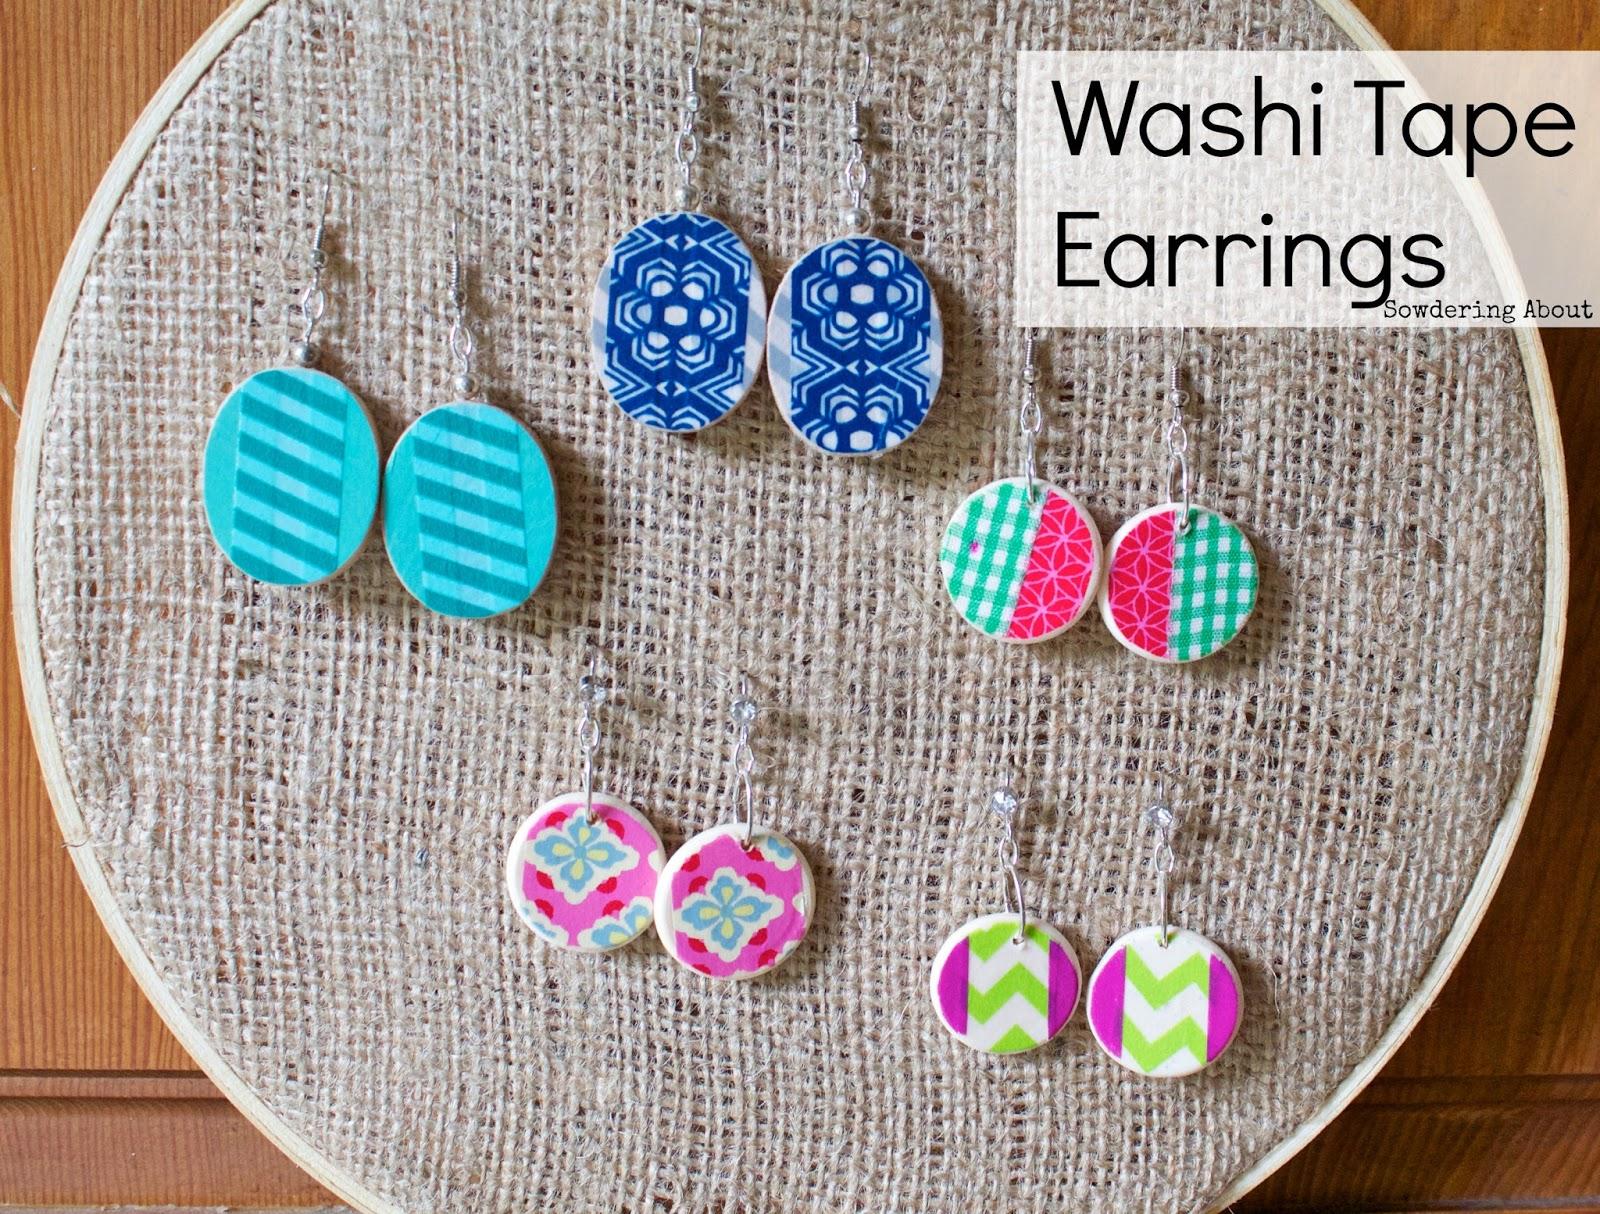 Washi Tape Ideas 100 Creative Ways To Use Washi Tape Diy Projects